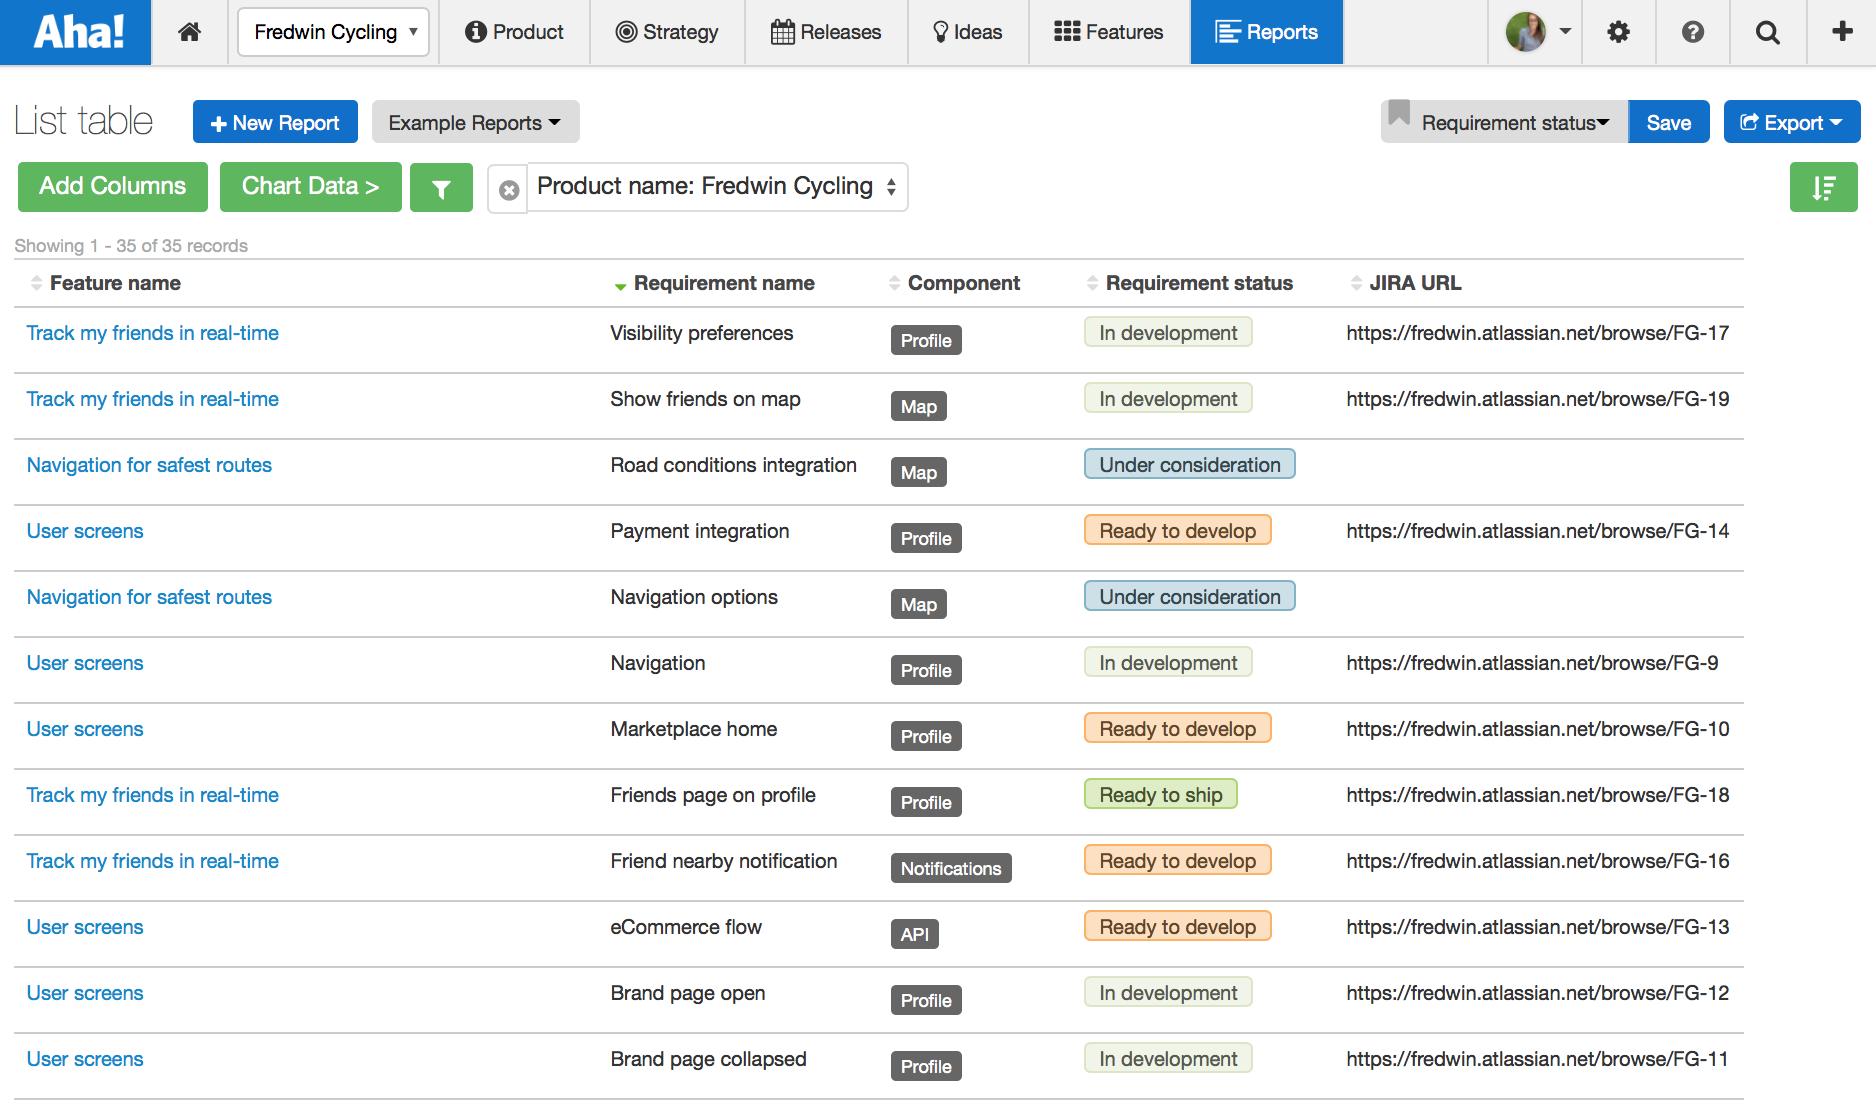 Aha! roadmapping software list report showing JIRA integration